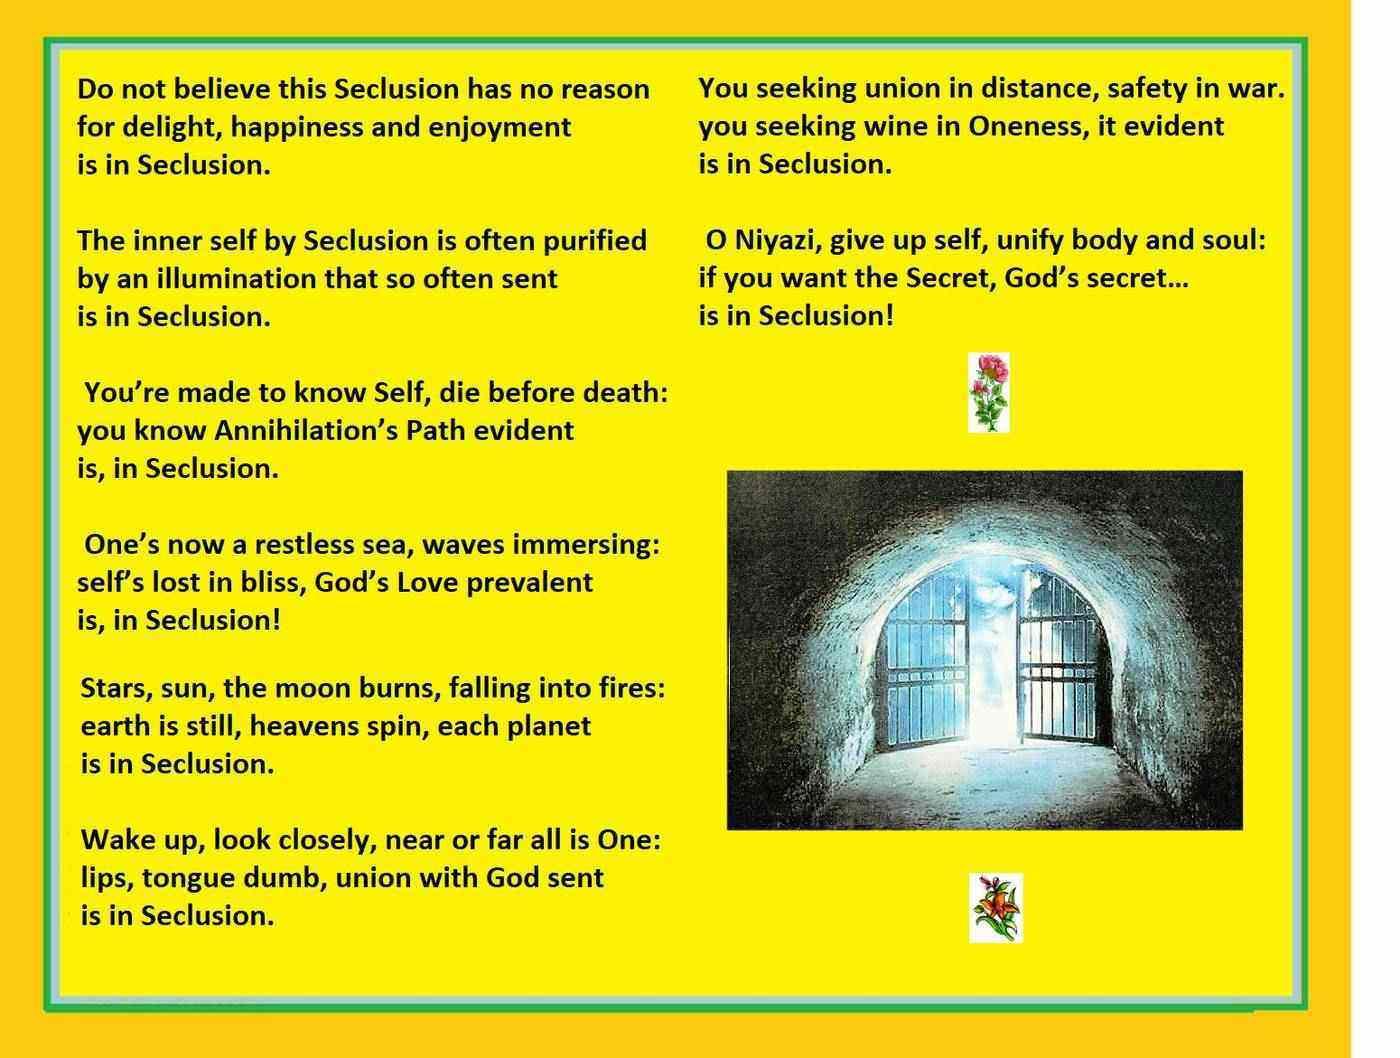 Poem about seclusion by Mizra Niyami